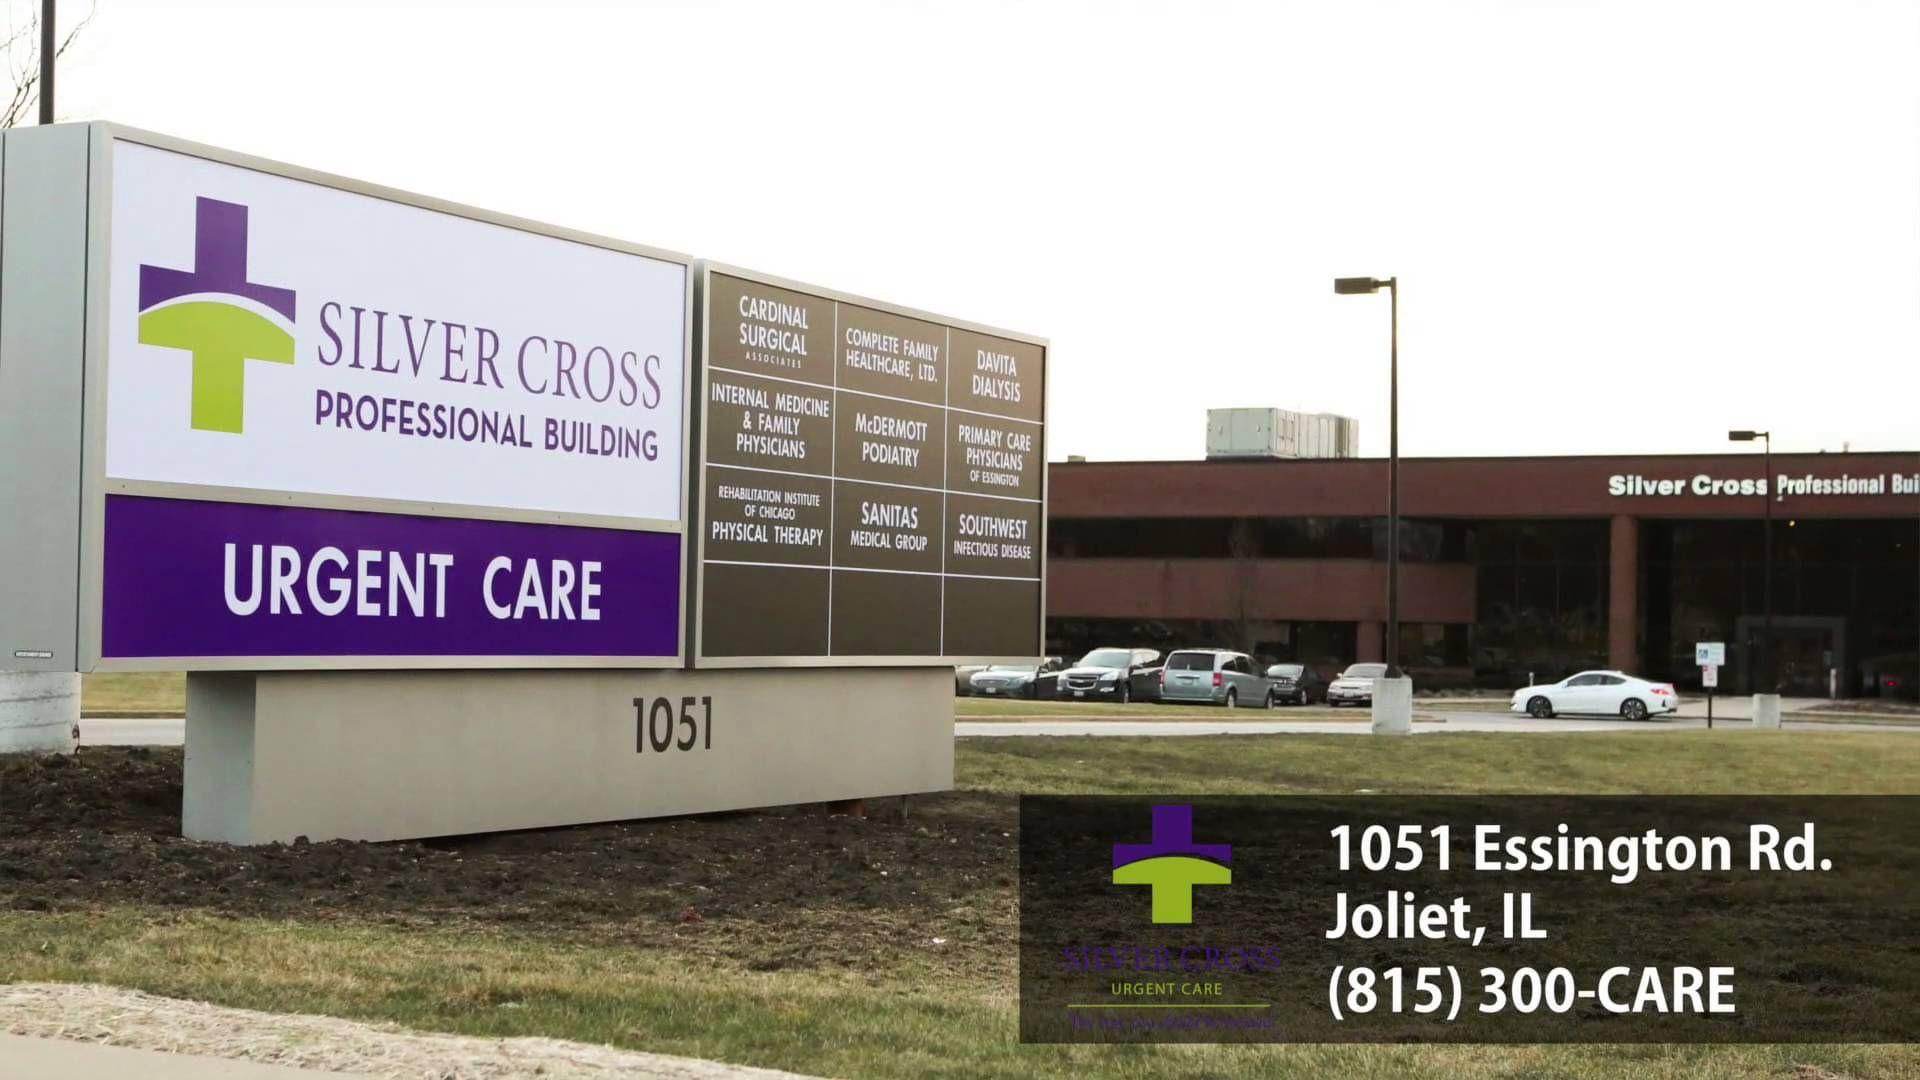 Silver Cross Urgent Care offers convenient, quick medical